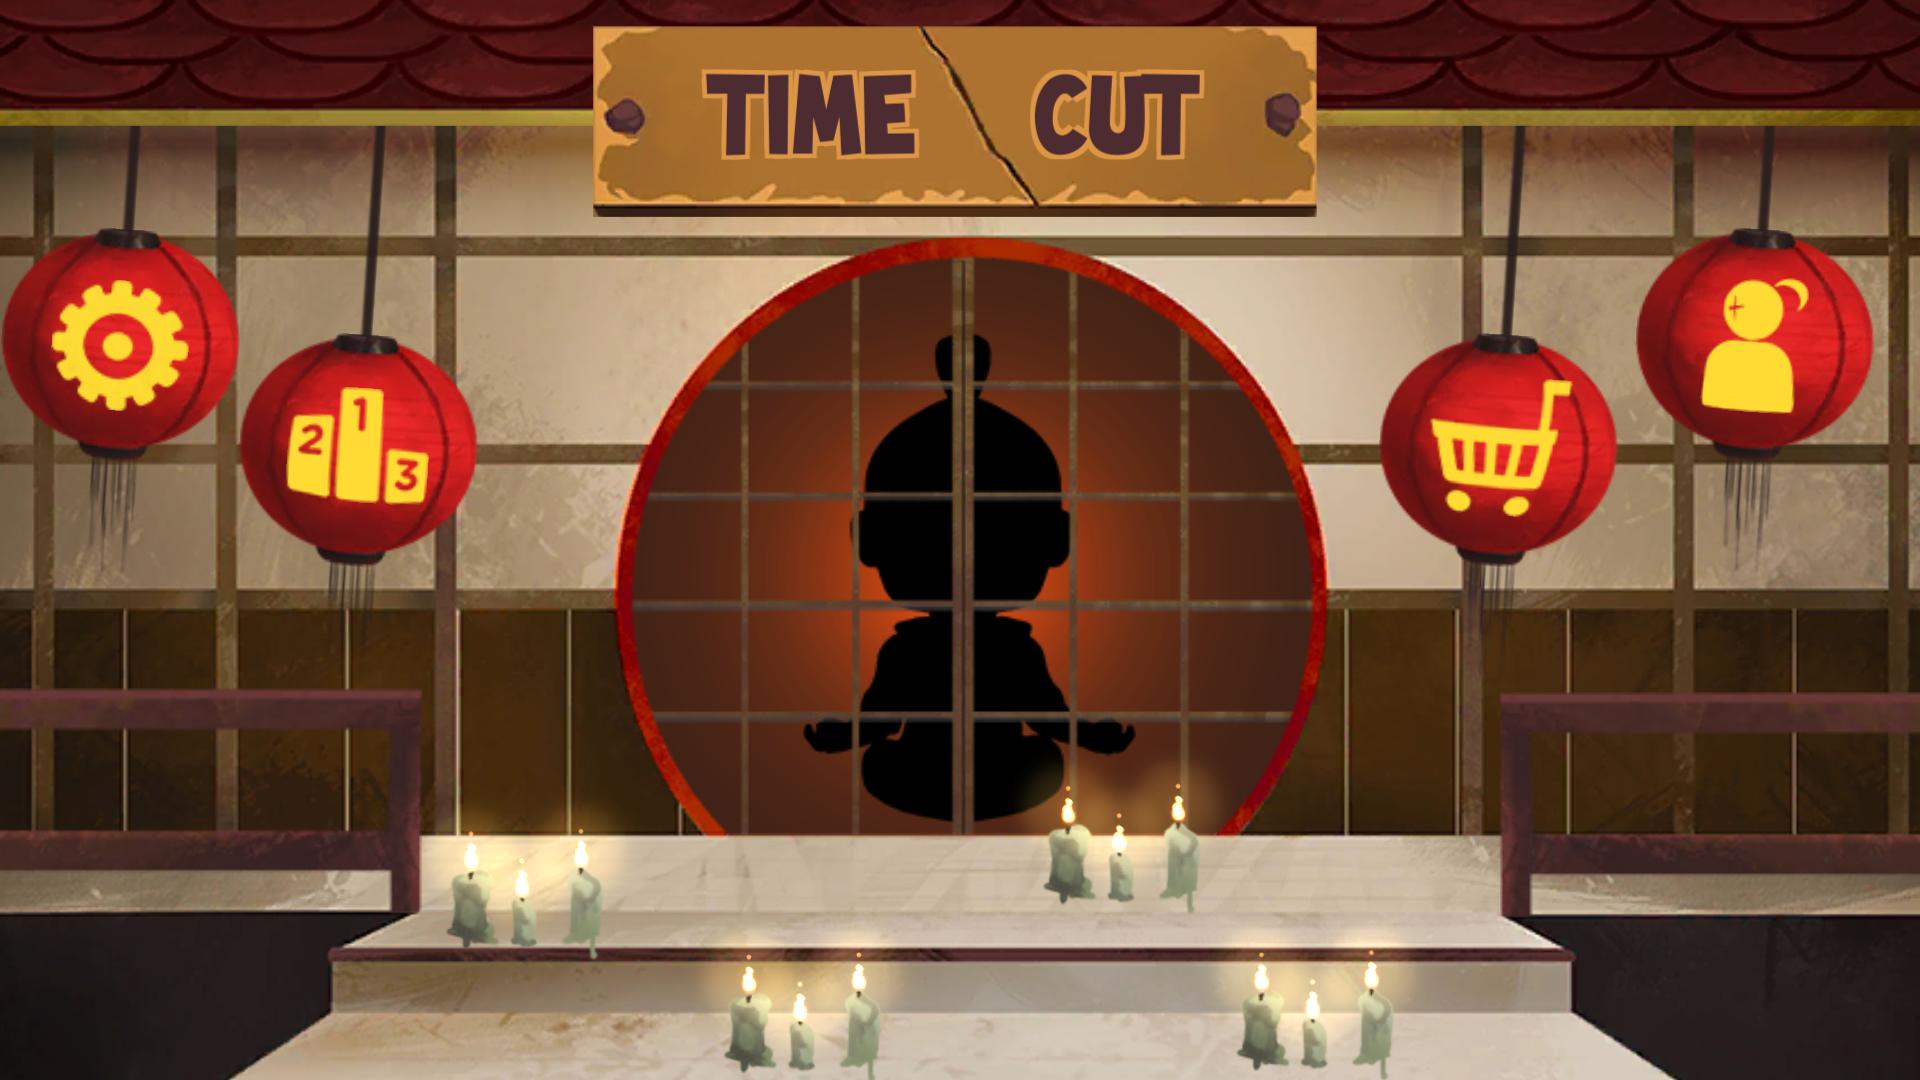 Time Cut